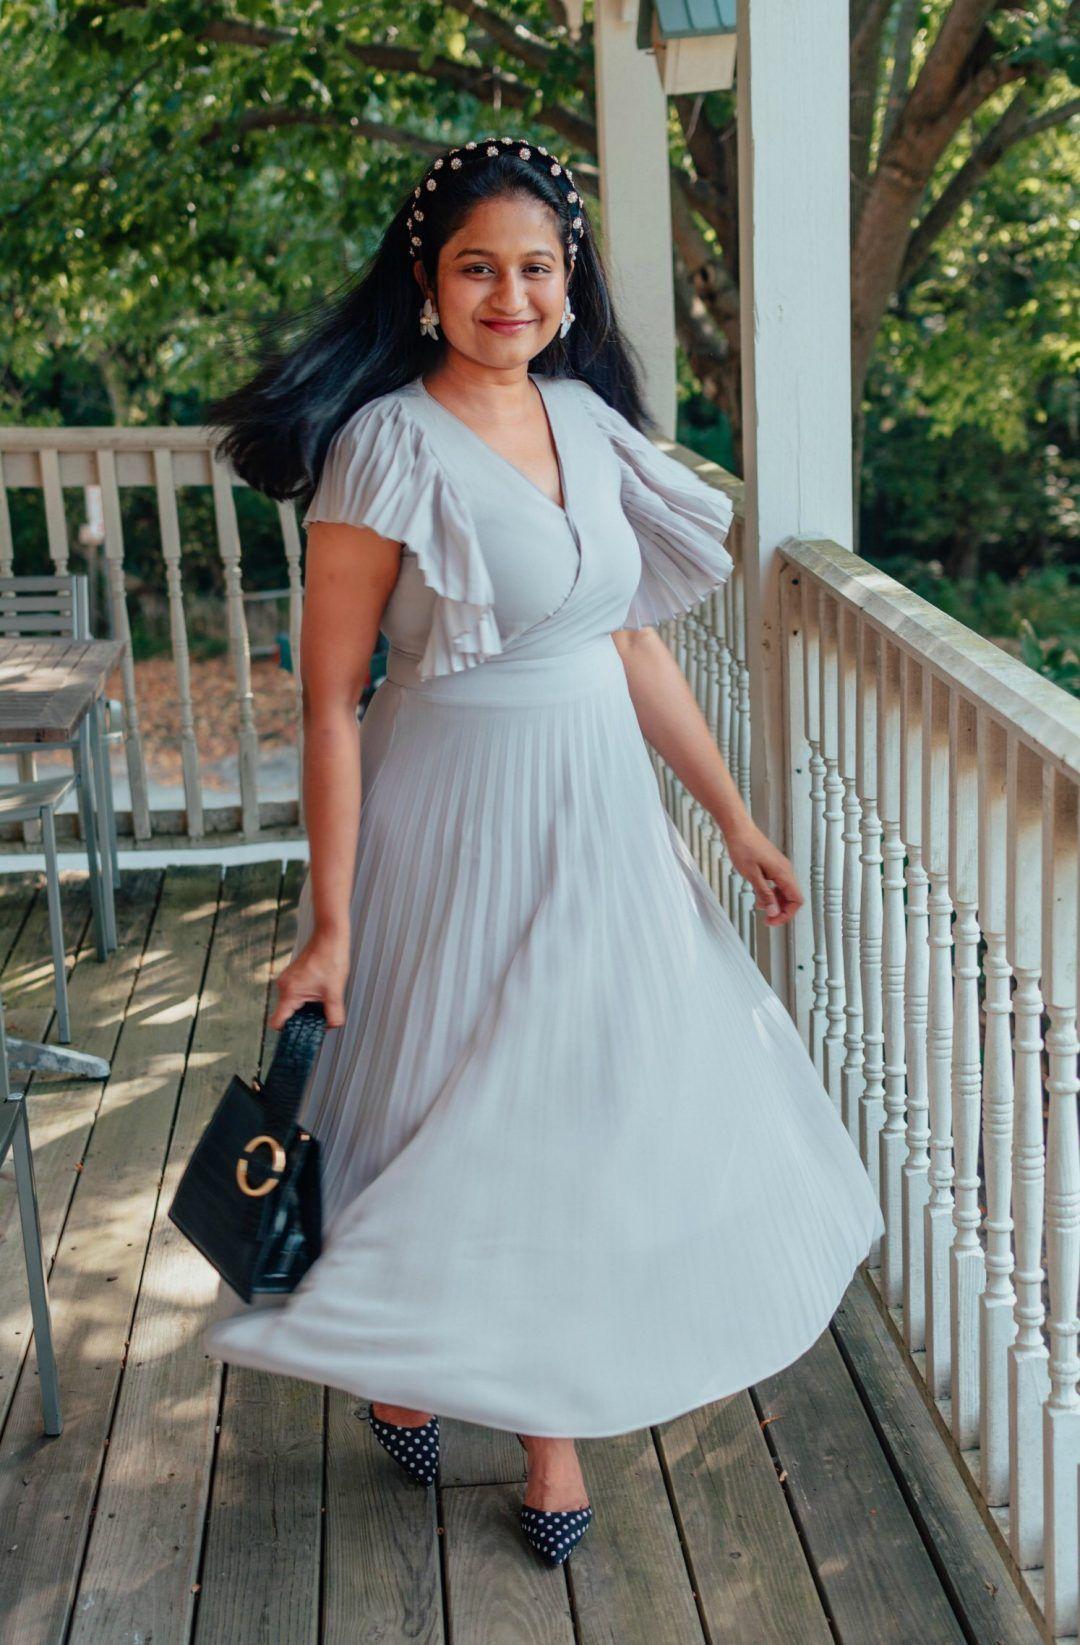 Modest Summer Wedding Guest Dresses for Every Wedding